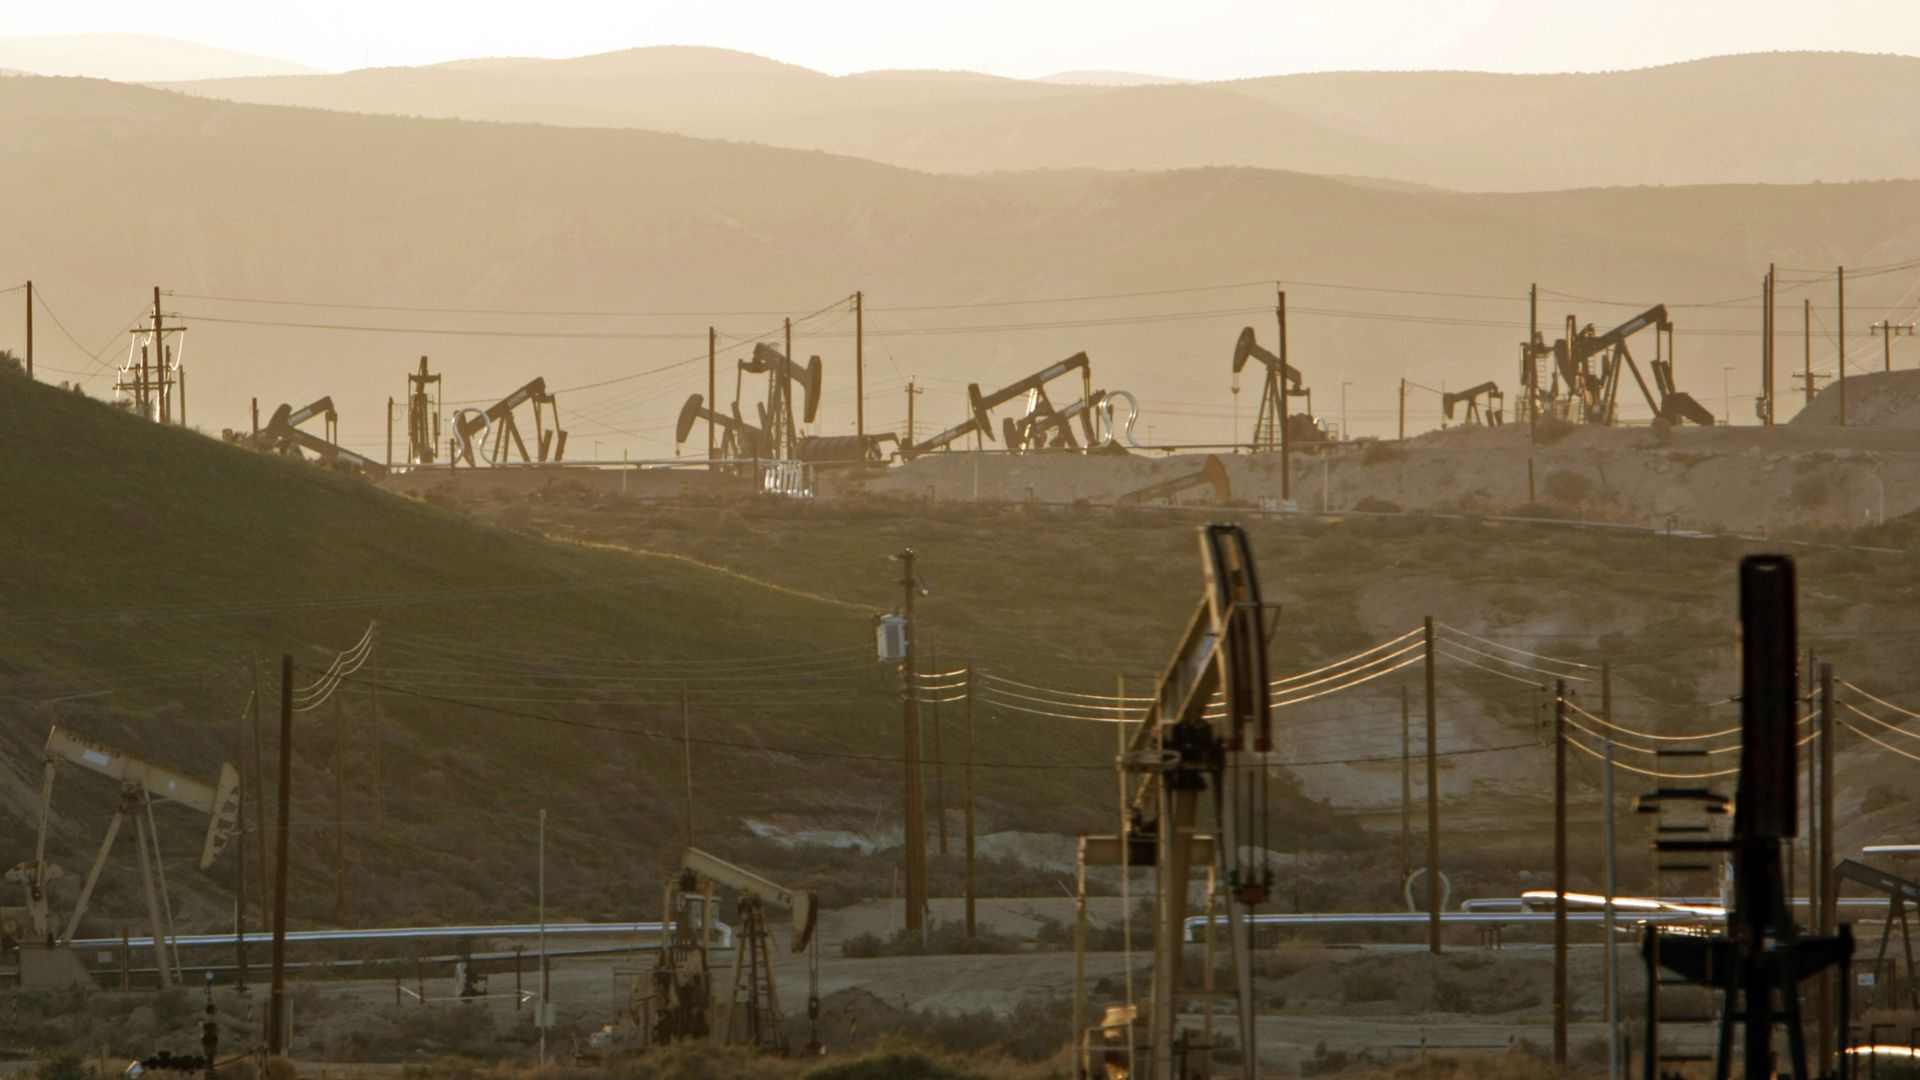 Oil rig pump jacks work the oil fields near the town of Maricopa